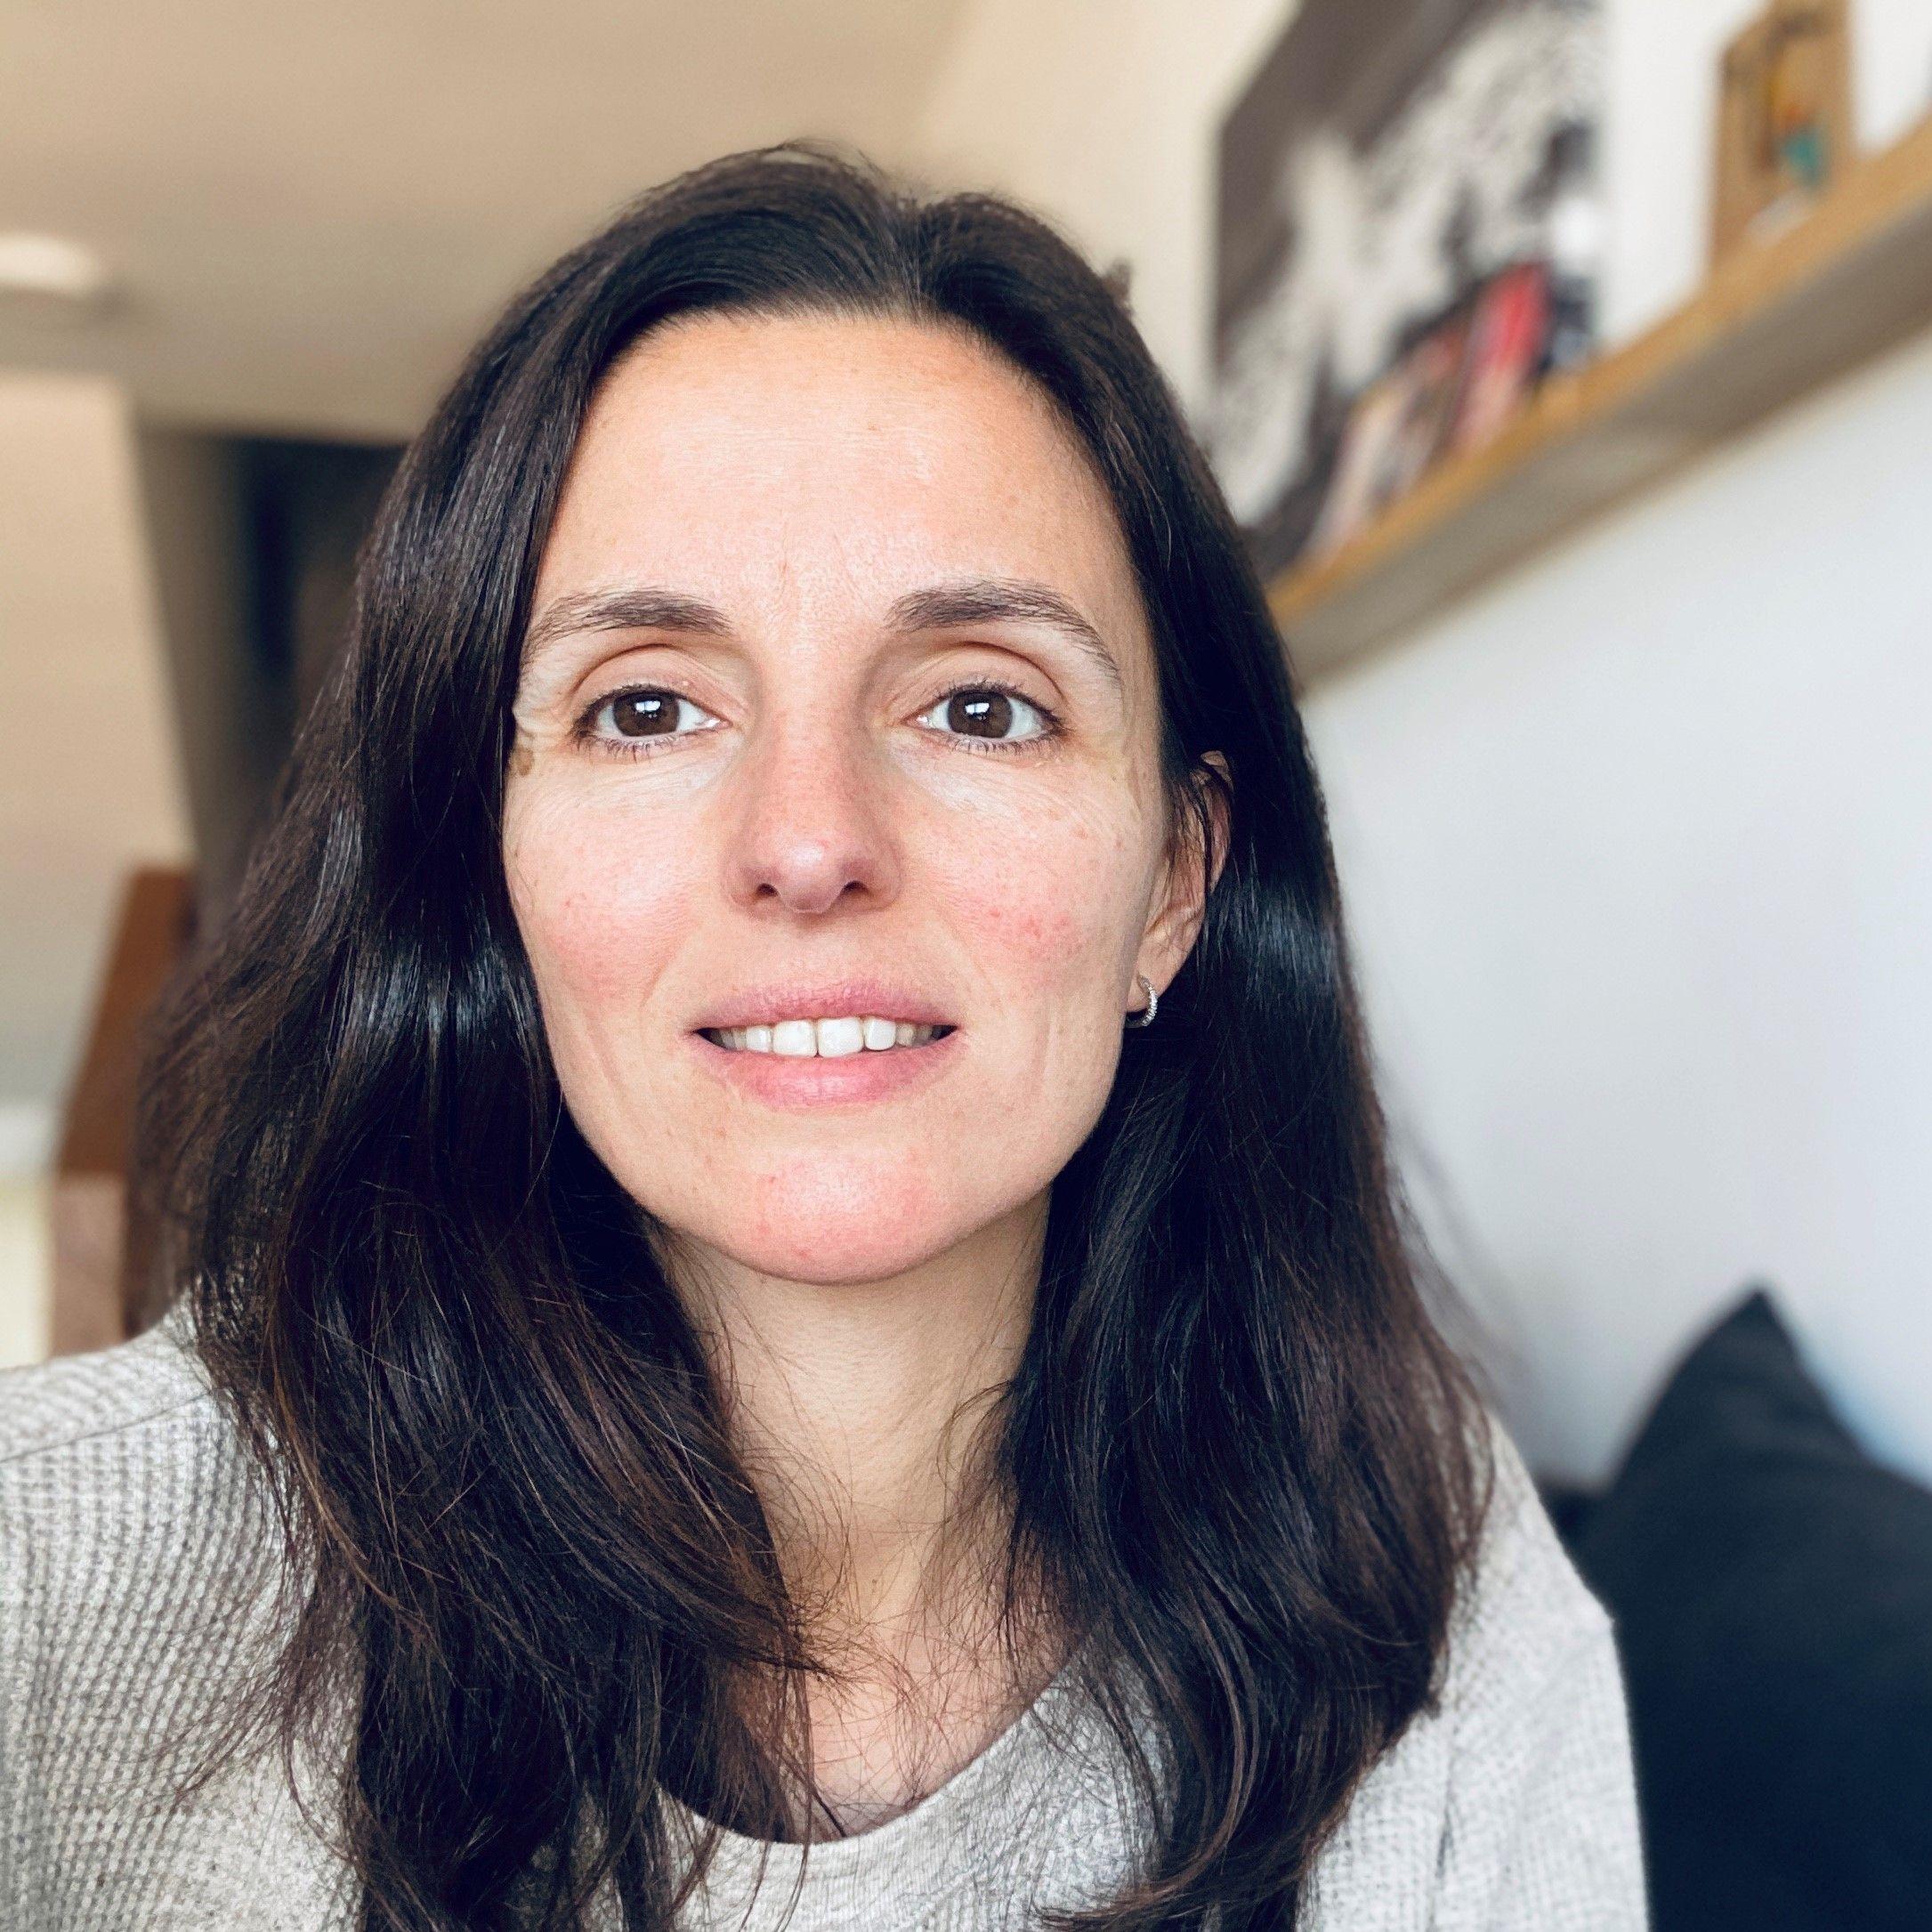 Marta Pegueroles Neyra